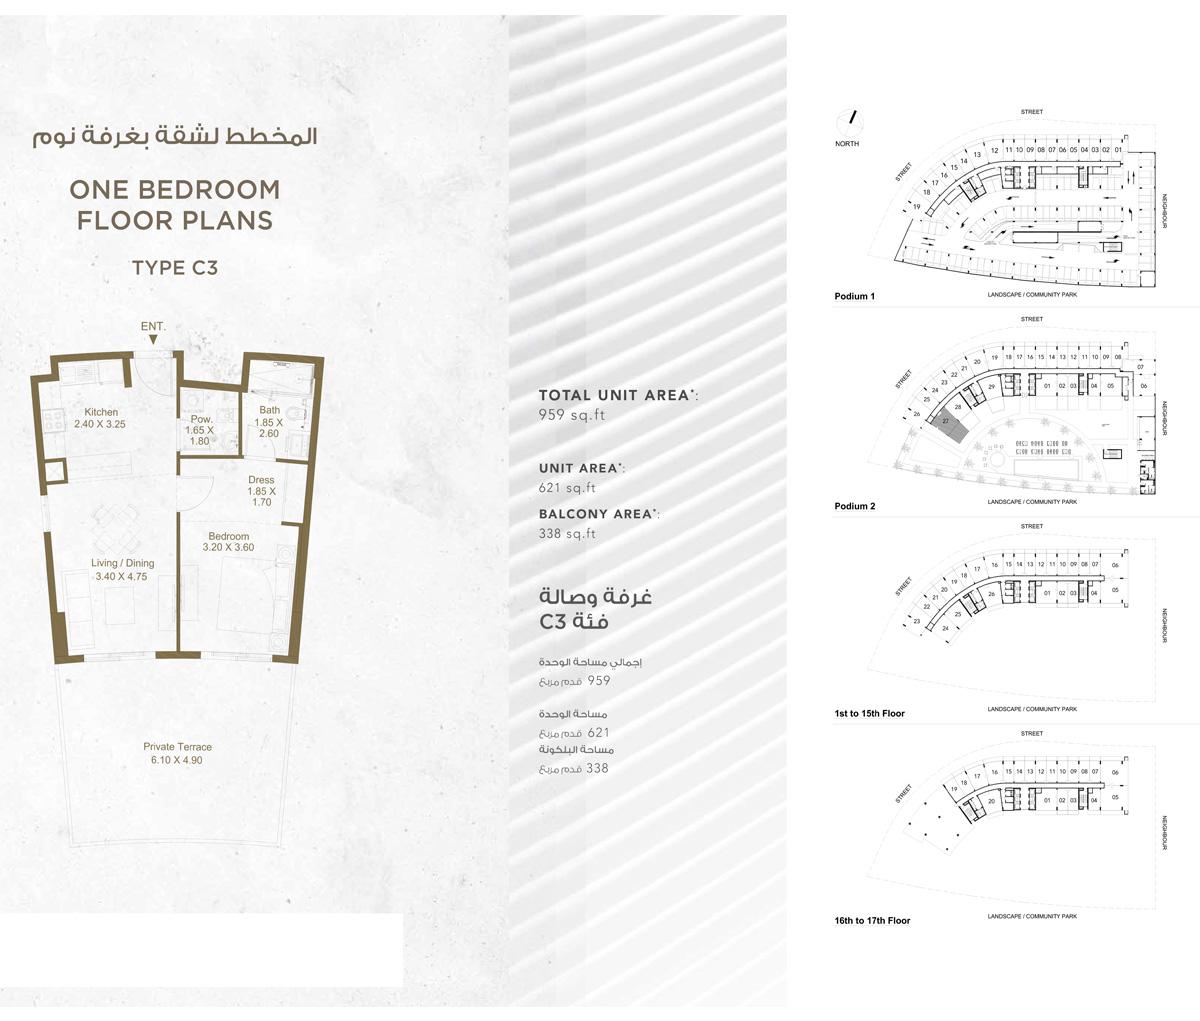 1 Bedroom Type C3, Size 959 sq.ft